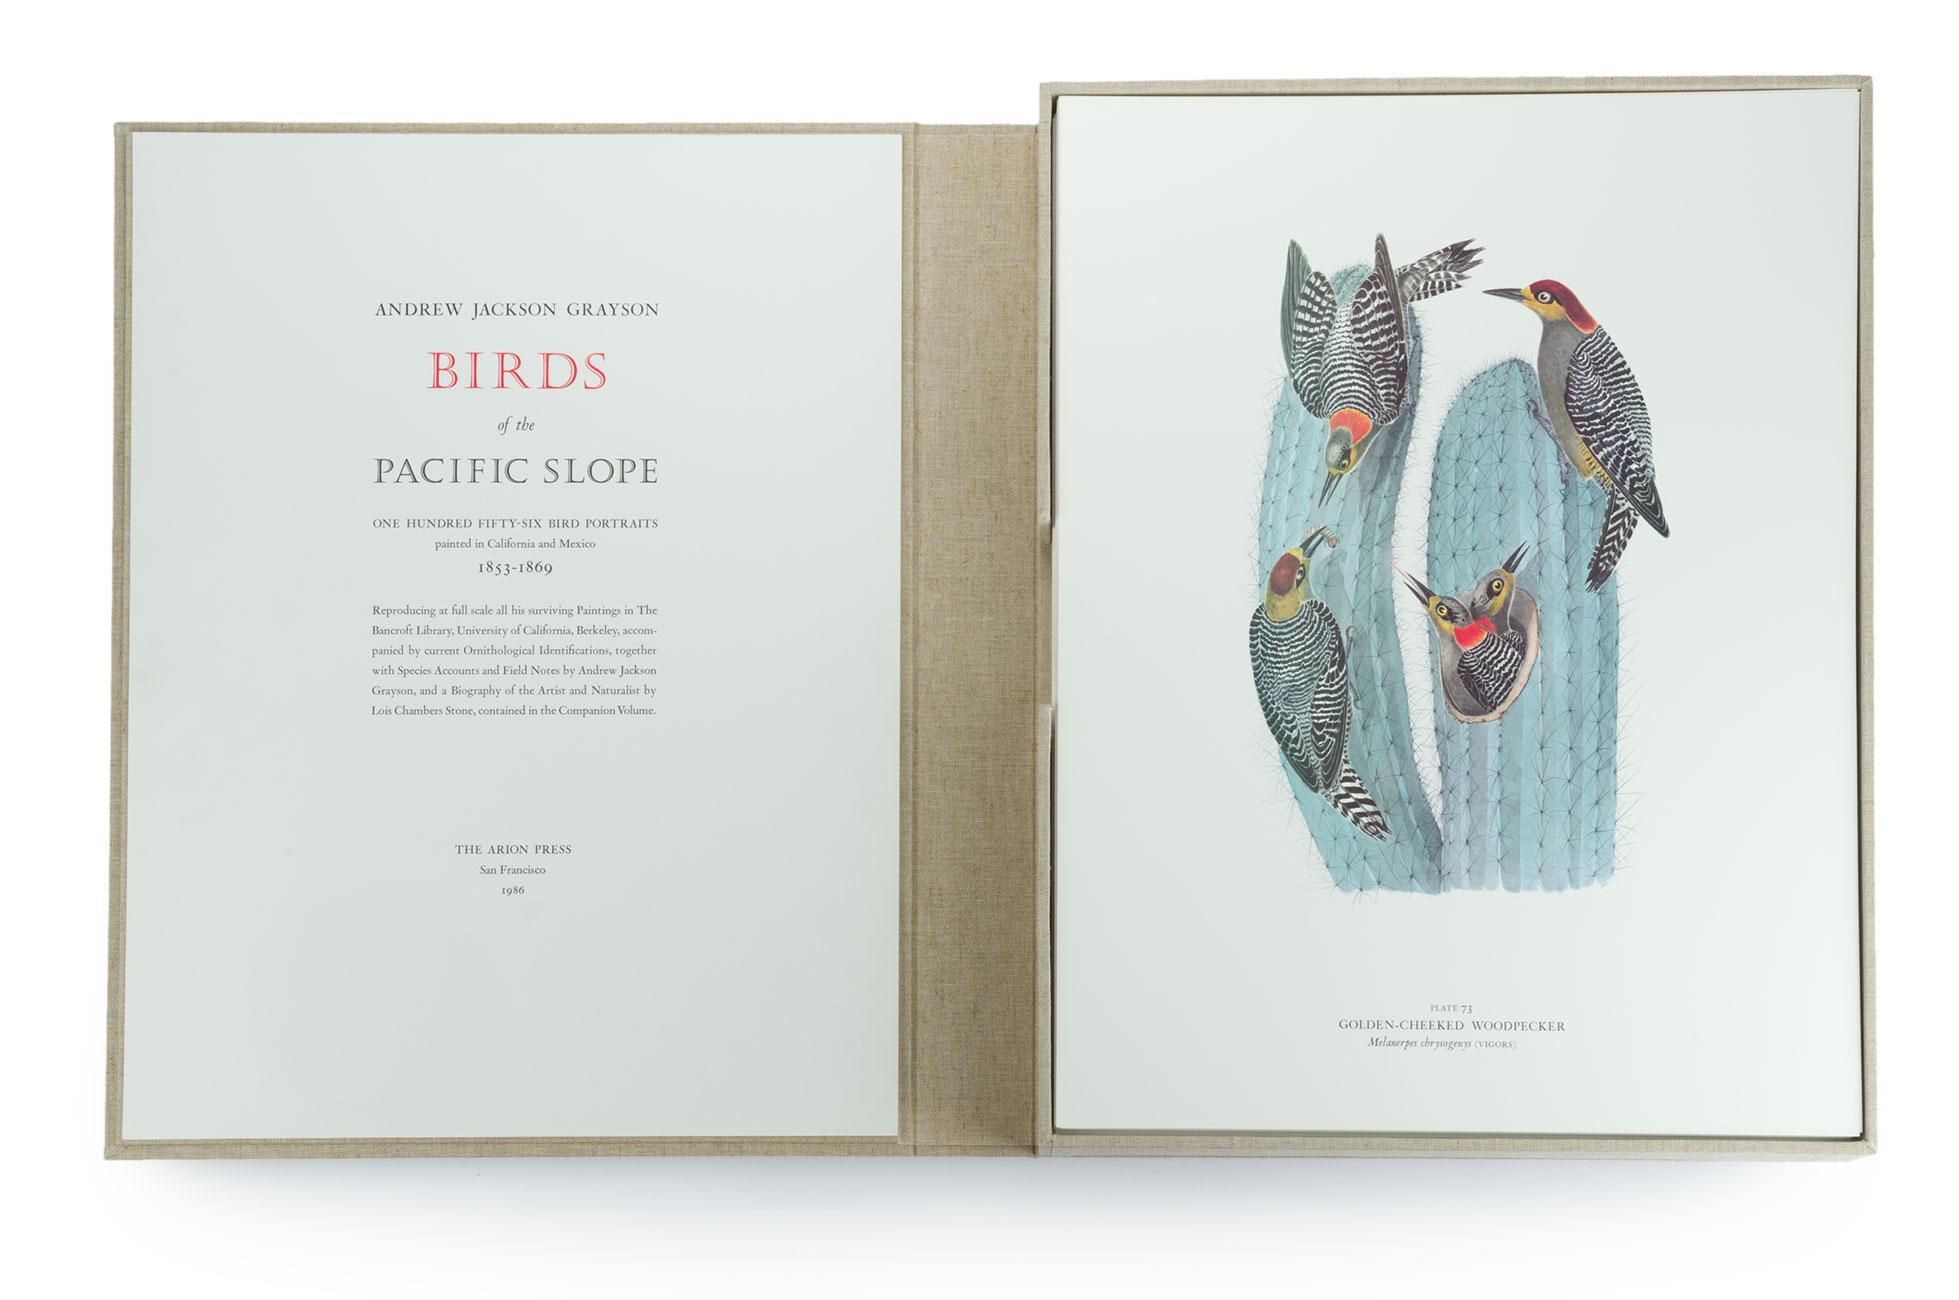 020_Birds-of-the-Pacific-Slope.portfolio.05.jpg